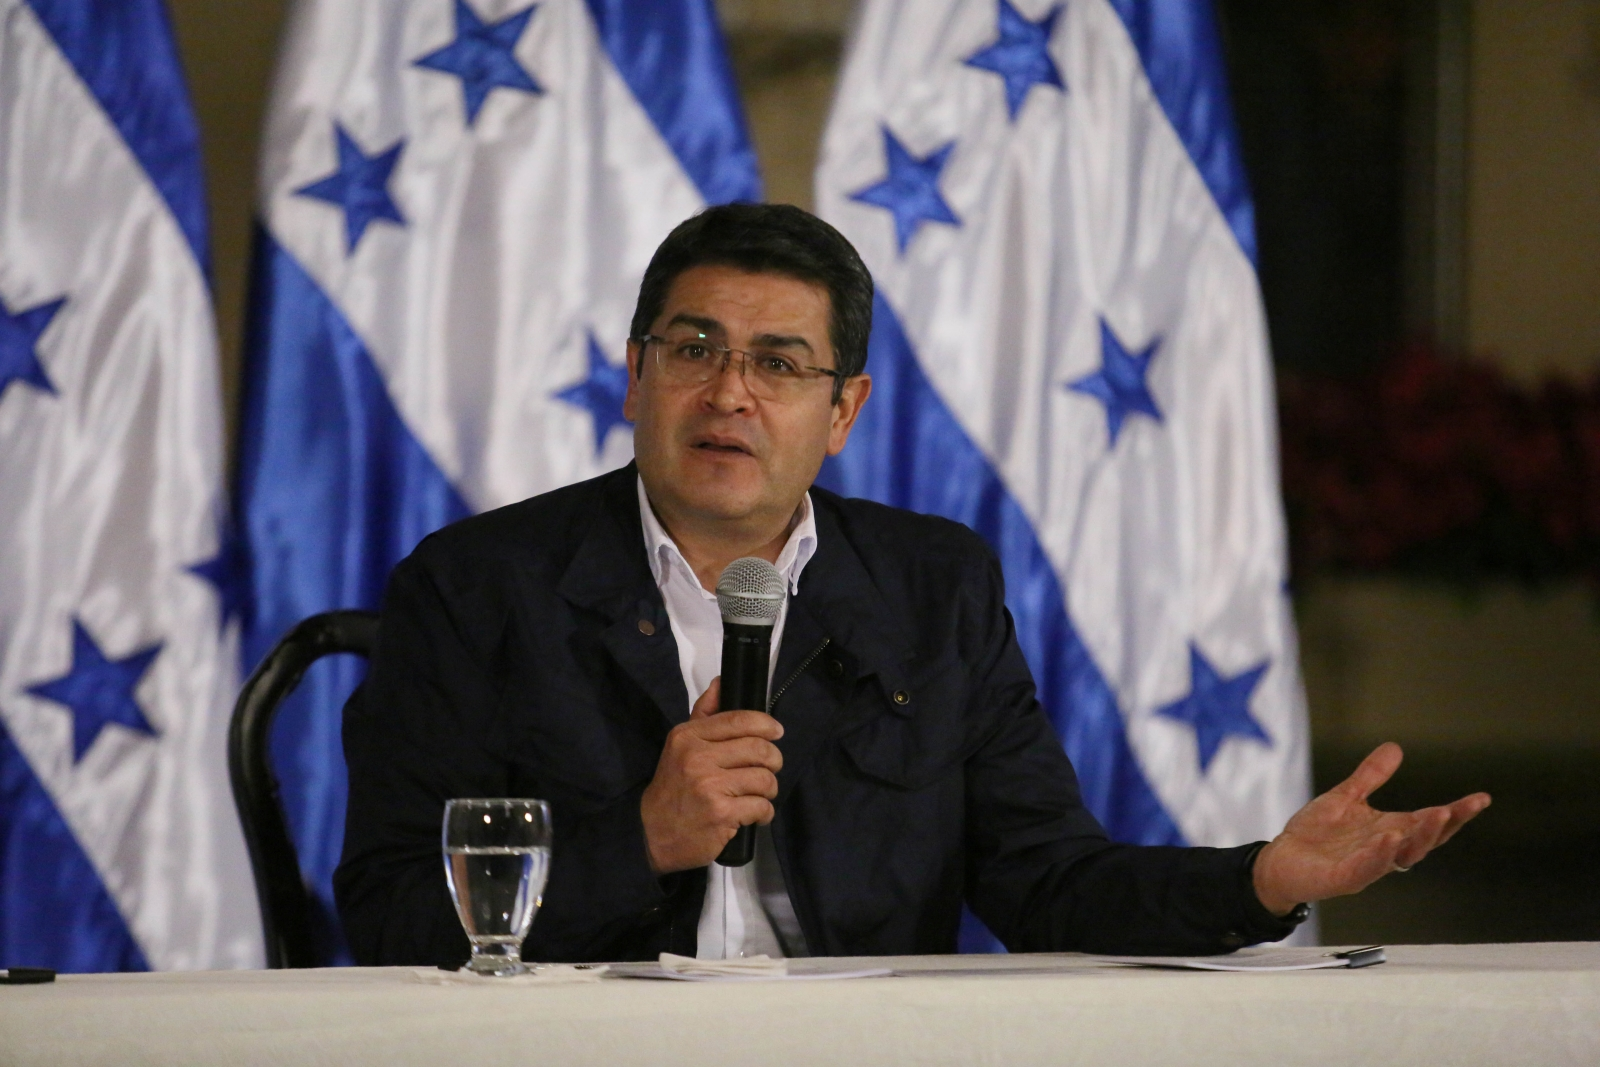 President Juan Orlando Hernandez